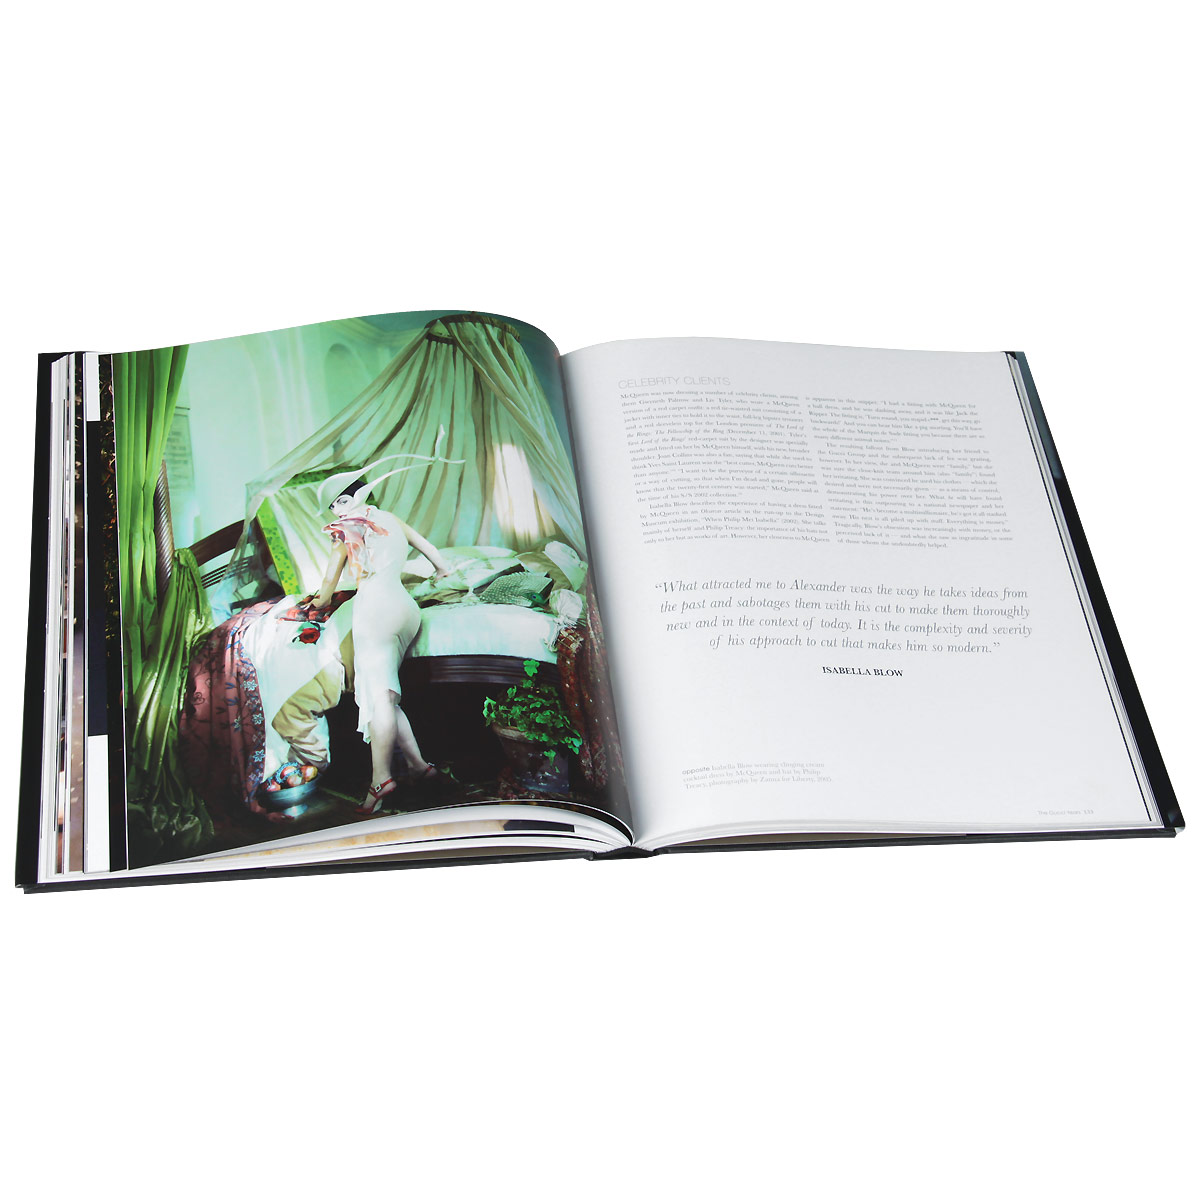 The Vilcek Foundation - 2015 Vilcek Prize Recipients Alexander mcqueen fashion visionary book